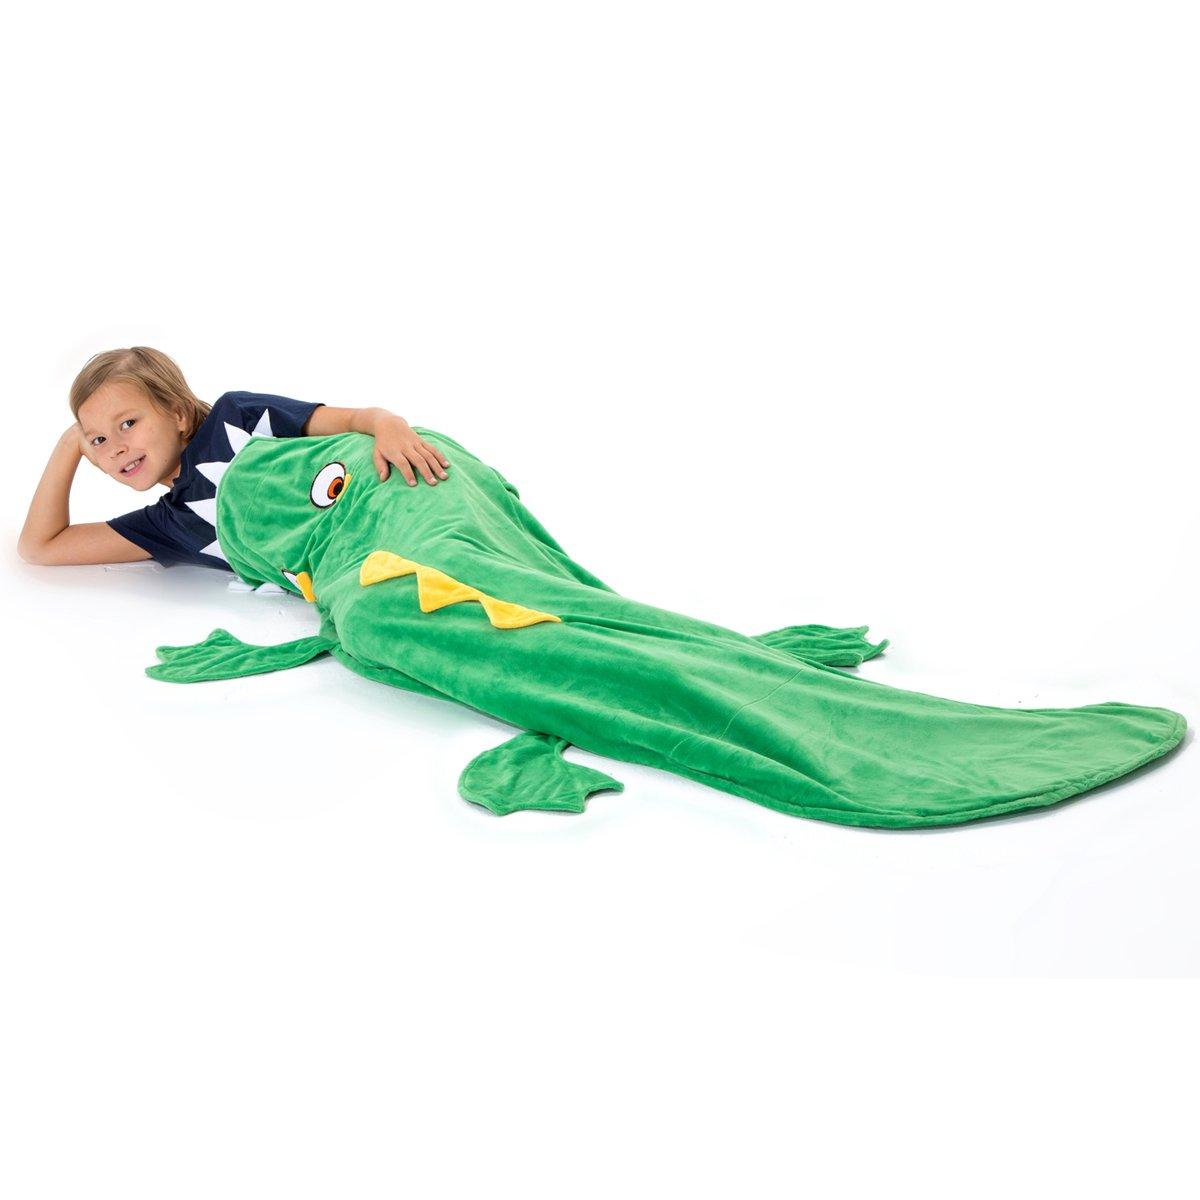 Echolife Green Crocodile Tail Blanket Soft Fleece Children Sleeping Bag Christmas Gifts for Kids 3-10 Years Old (Crocodile)